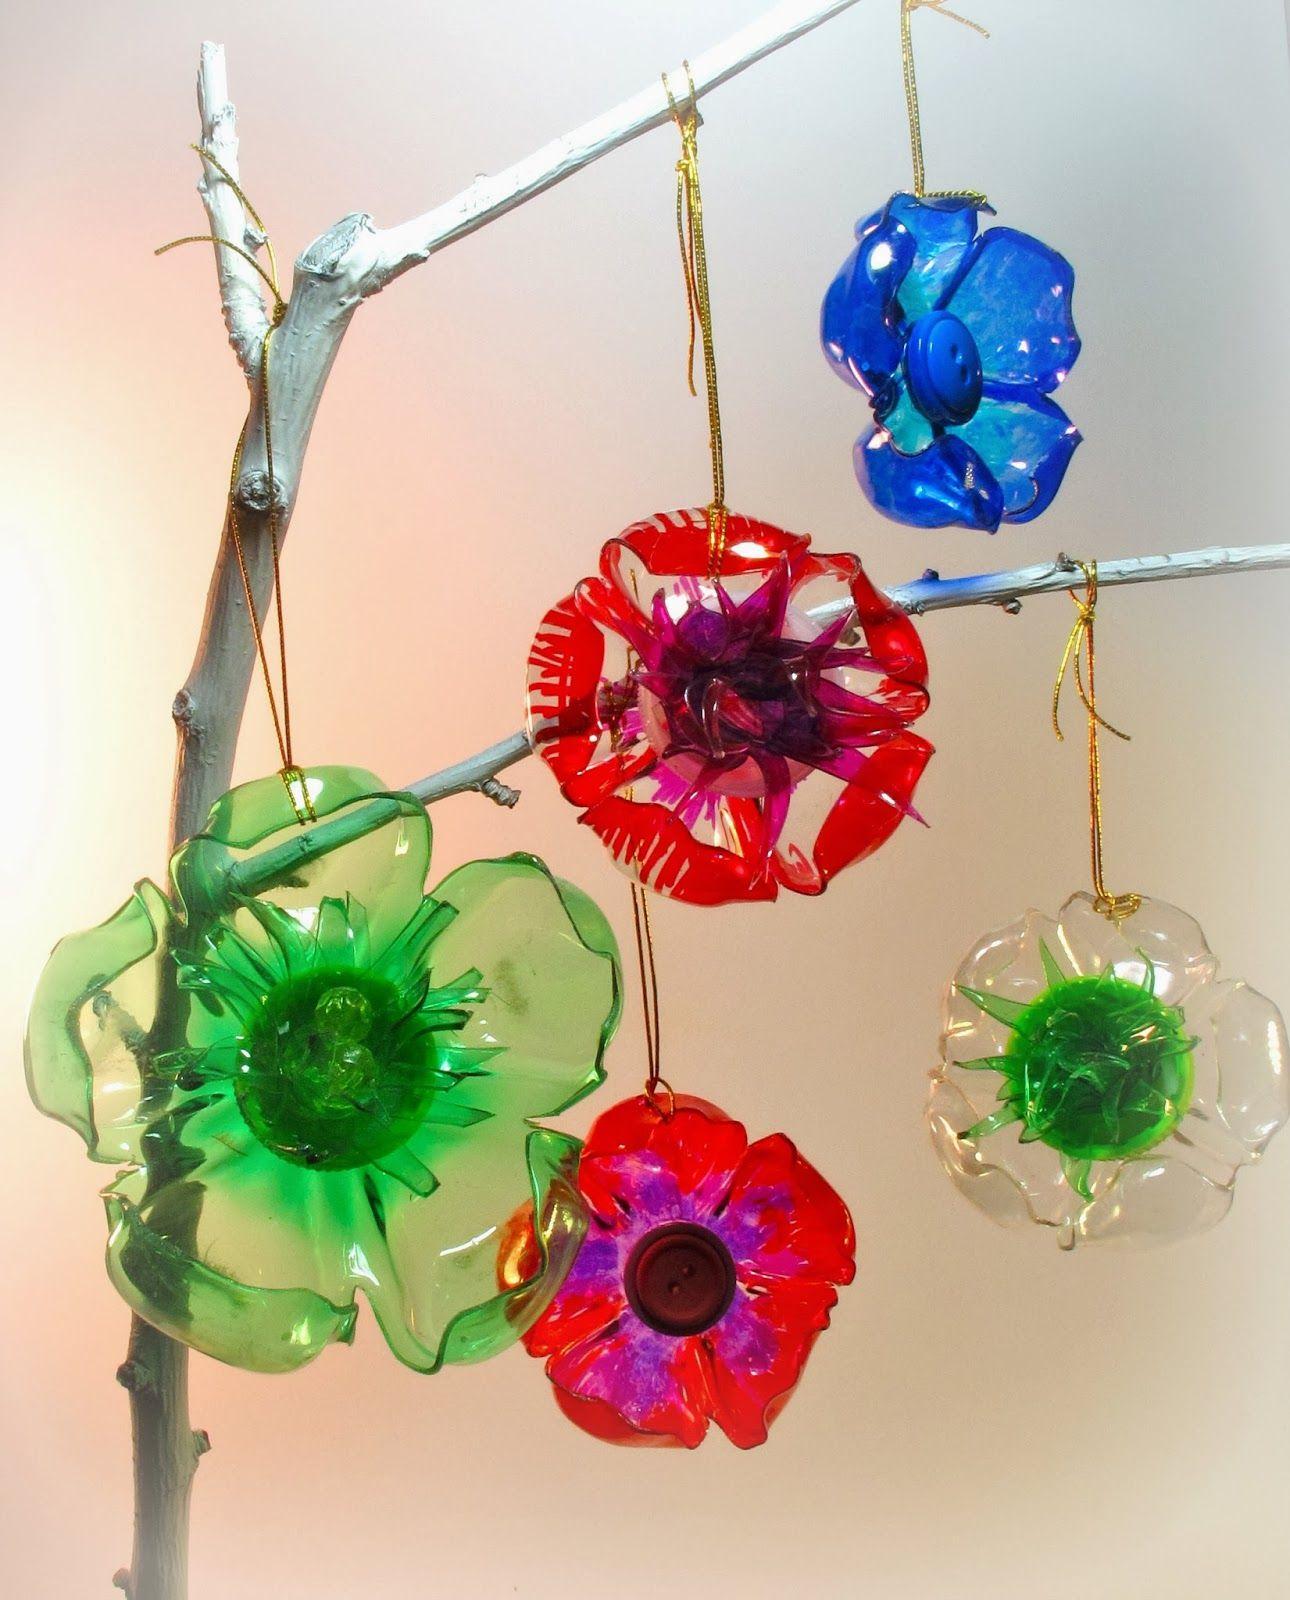 Blukatkraft Diy Recycled Plastic Bottle Crafts Kid S Crafts Diy Recycle Plastic Plastic Bottle Art Plastic Bottle Crafts